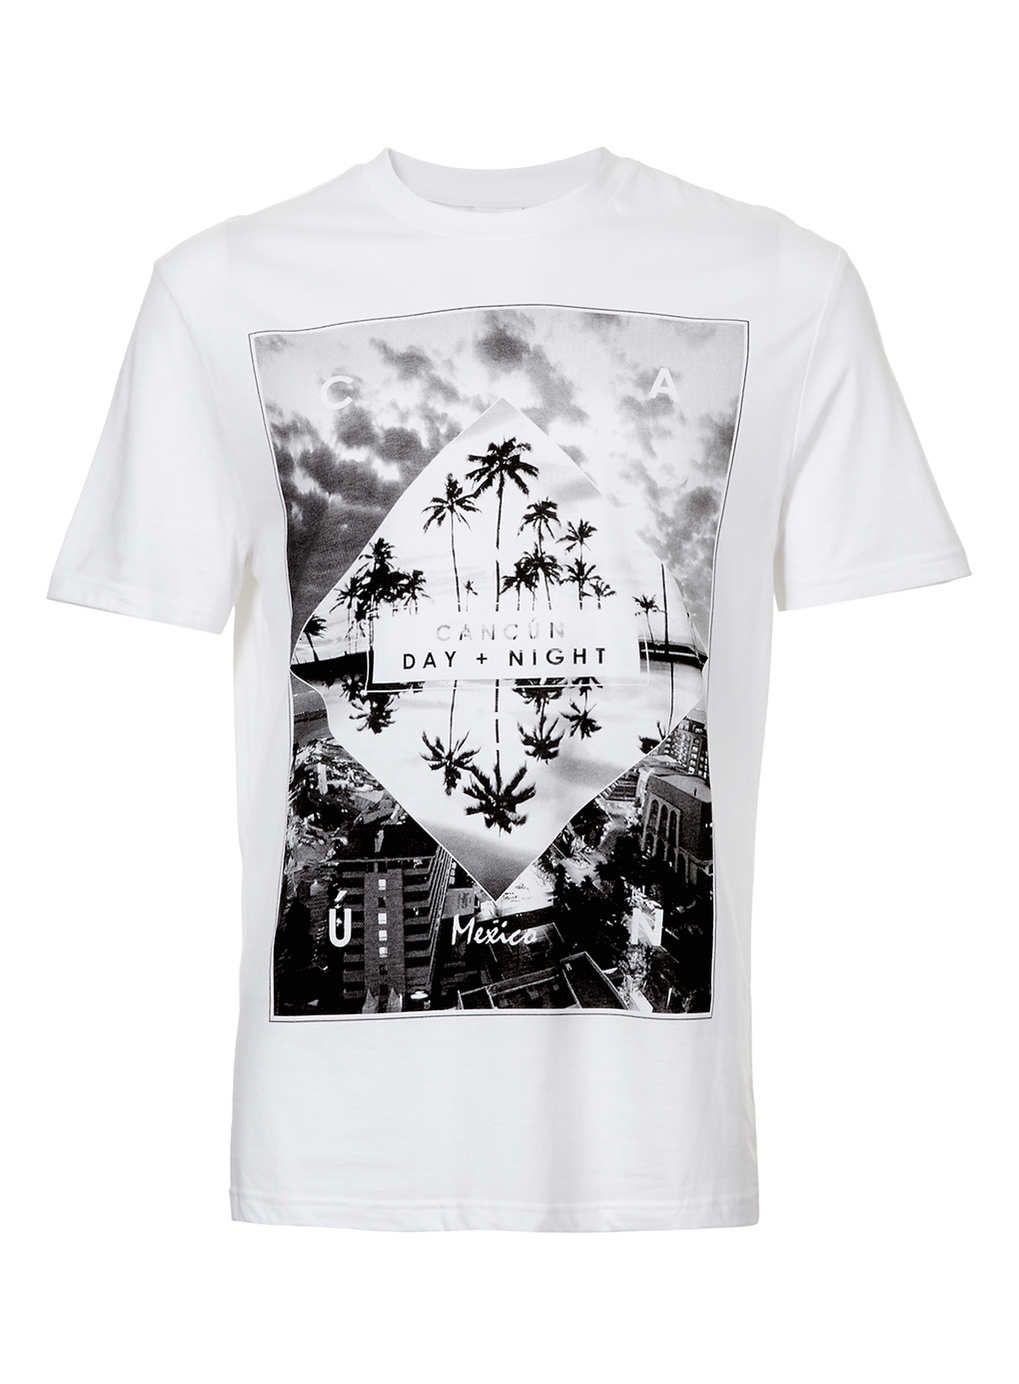 7b865ab2b2b4 White Cancun Print T-Shirt - Men's T-shirts & Tanks - Clothing - TOPMAN USA